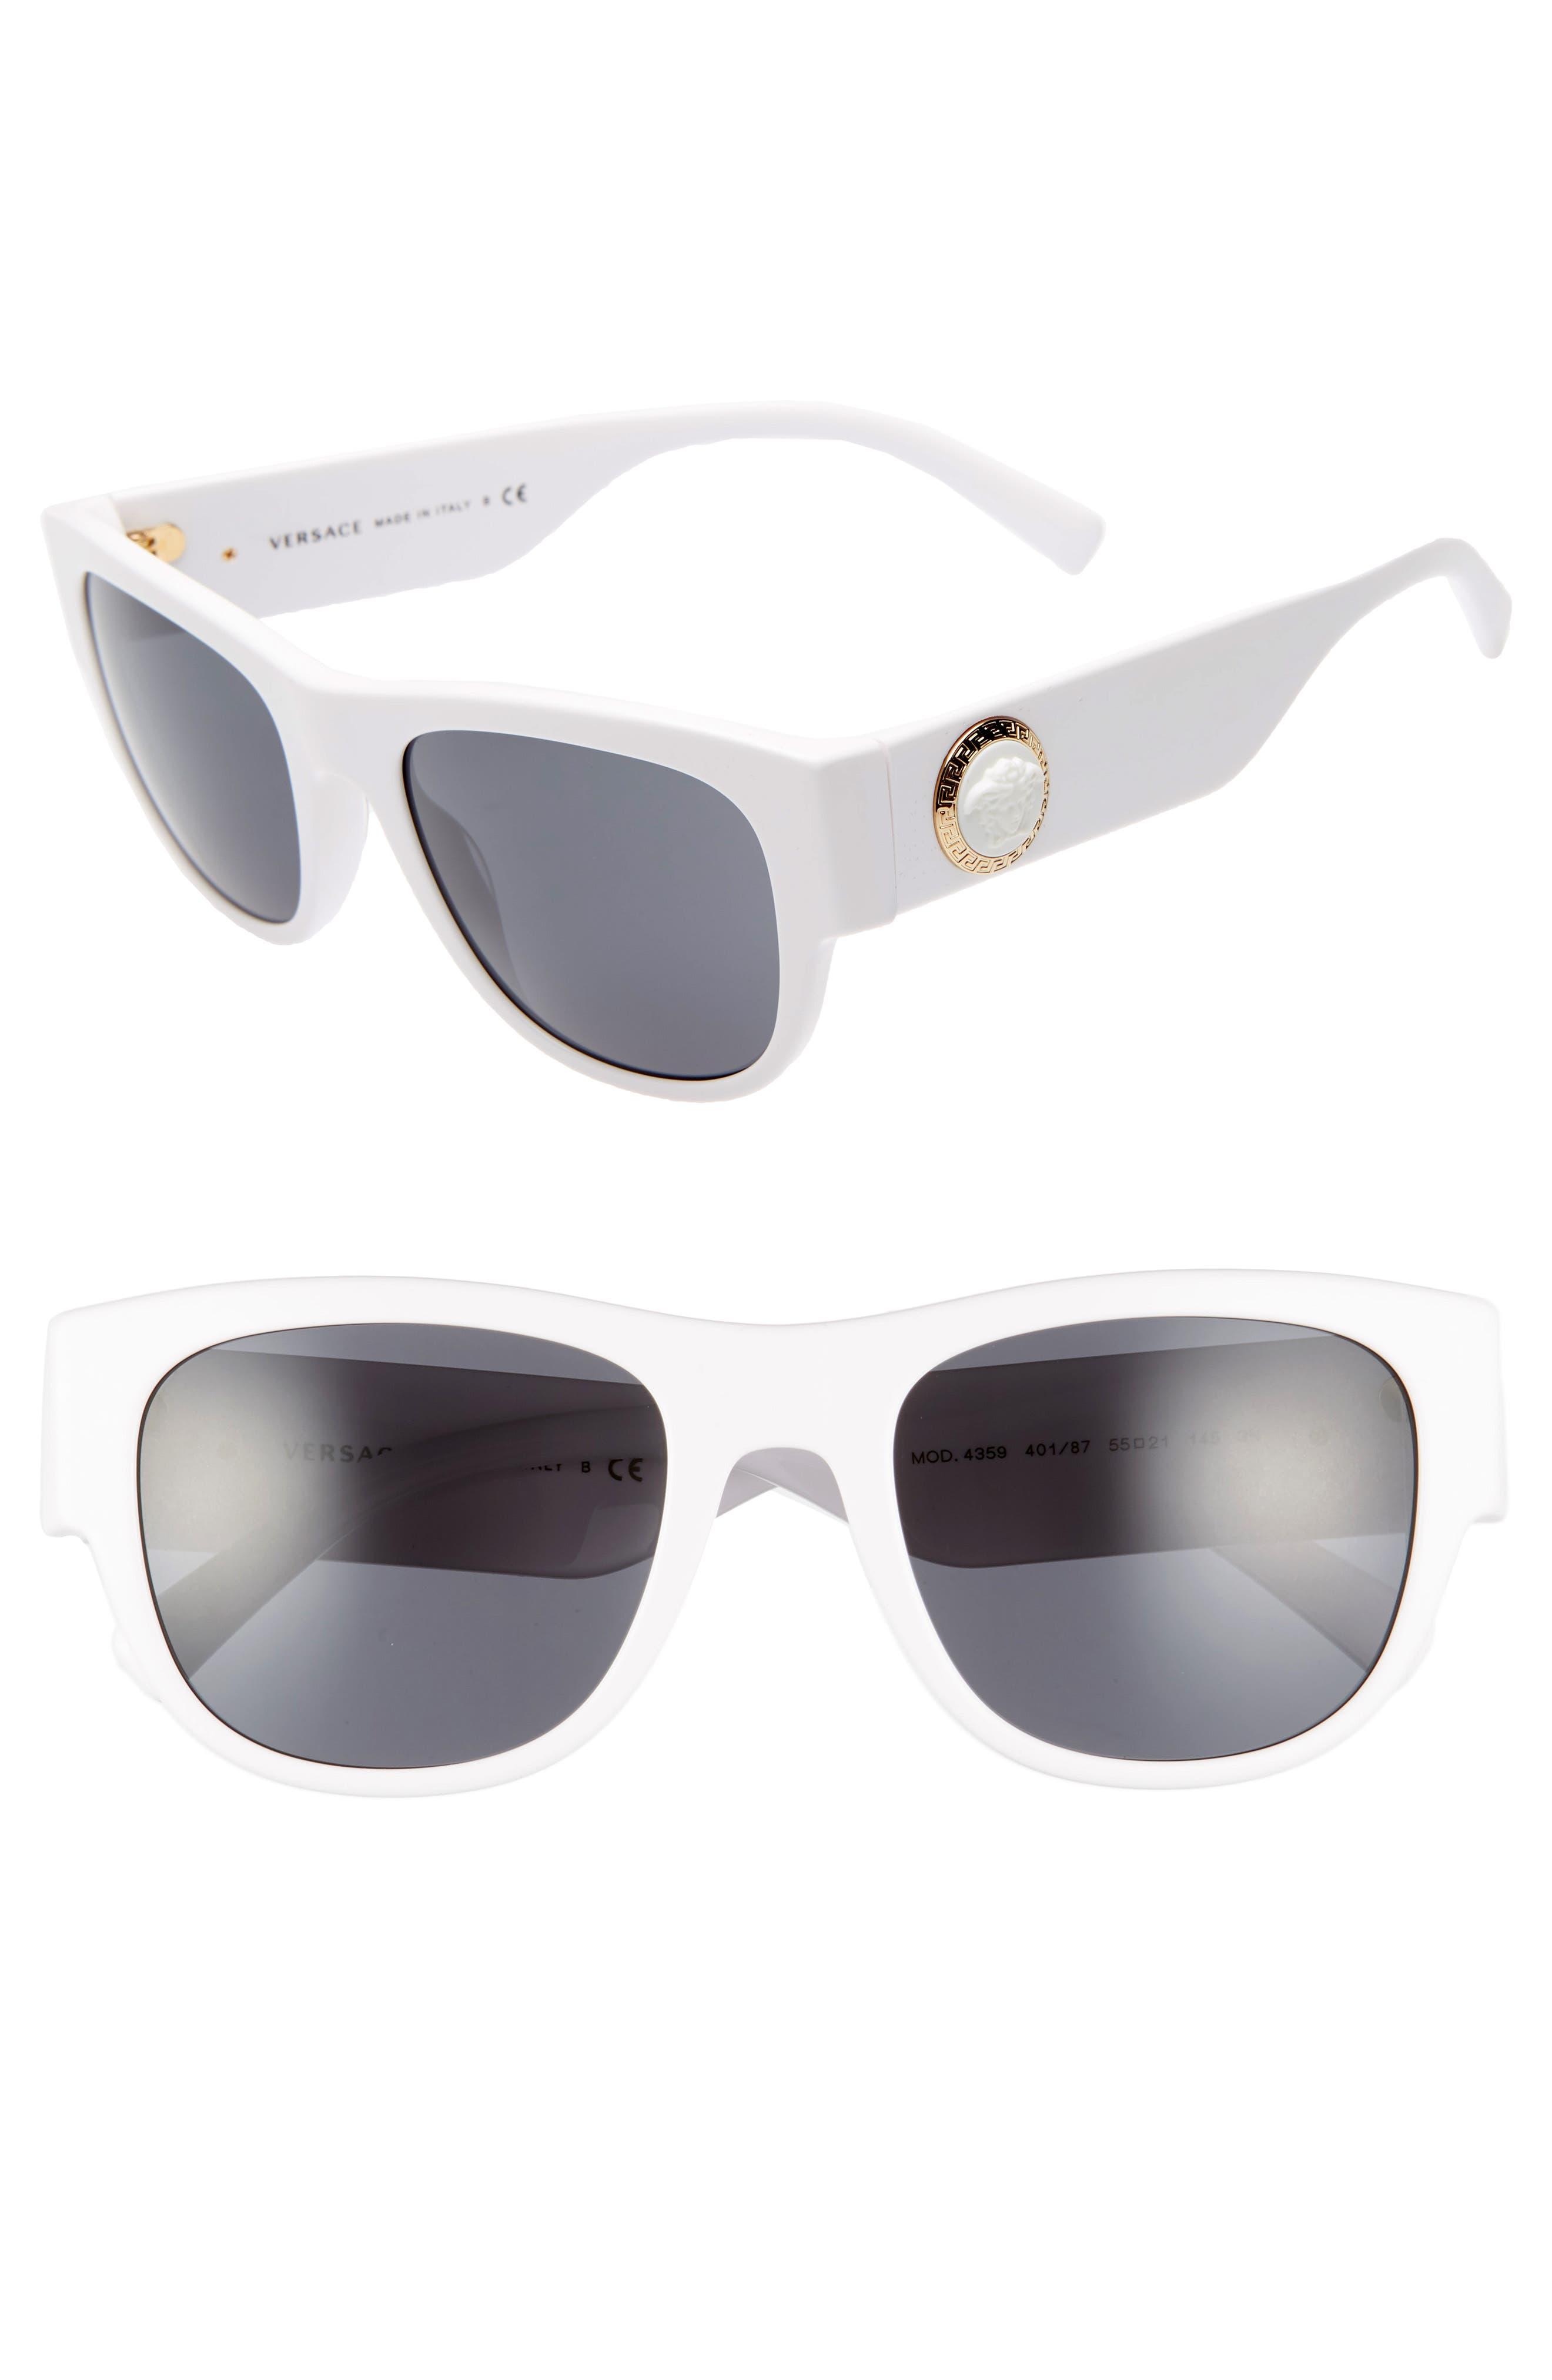 55mm Square Sunglasses, Main, color, WHITE/ GREY SOLID